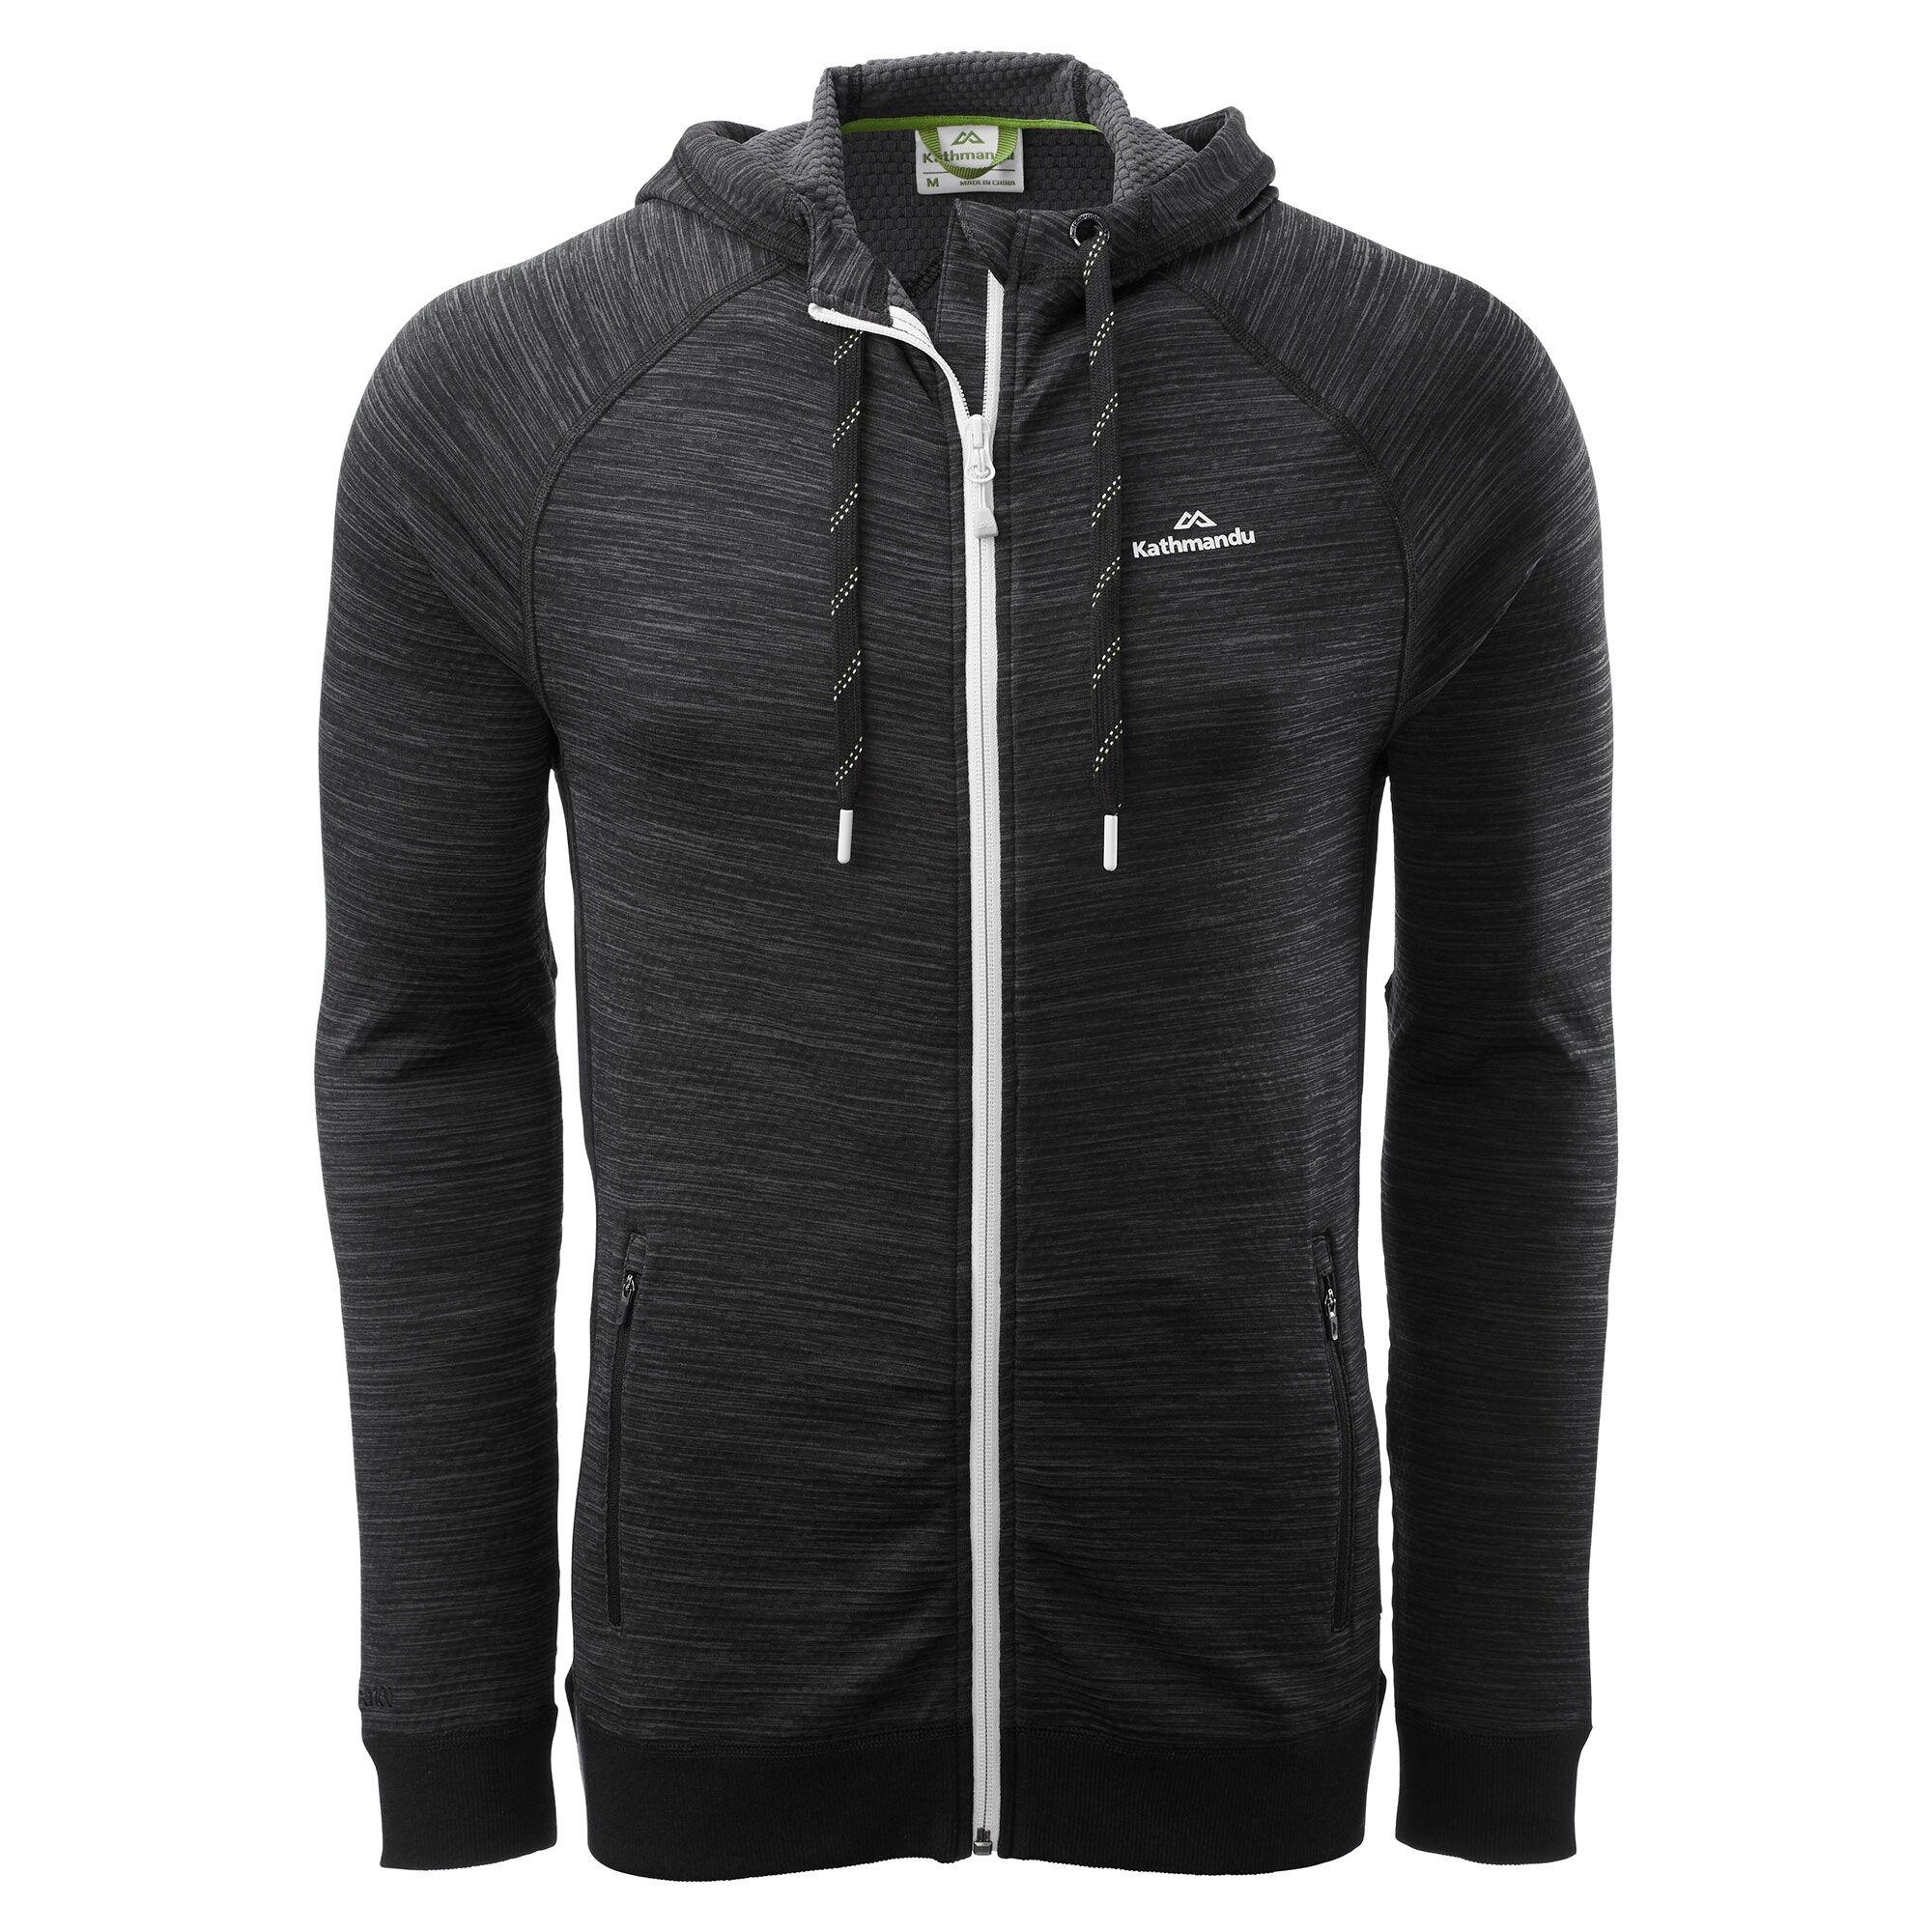 Kathmandu Acota Men's Hooded Fleece Jacket  - Granite Marle/Black - Size: Extra Large